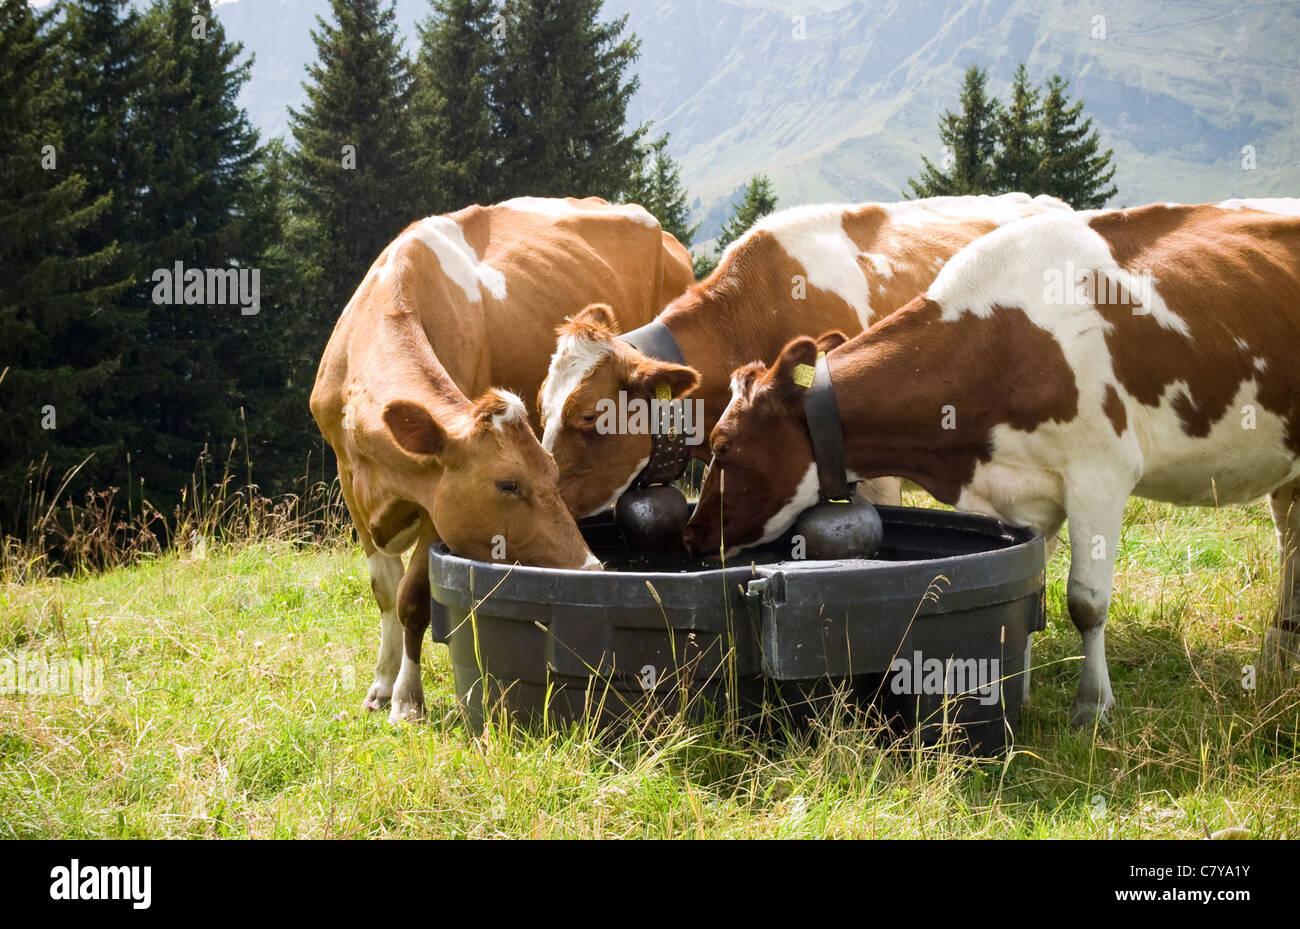 Switzerland, Cows, Animals, Alps, Switzerland Sun, Cows Grazing, Drinking, Cow Bells - Stock Image